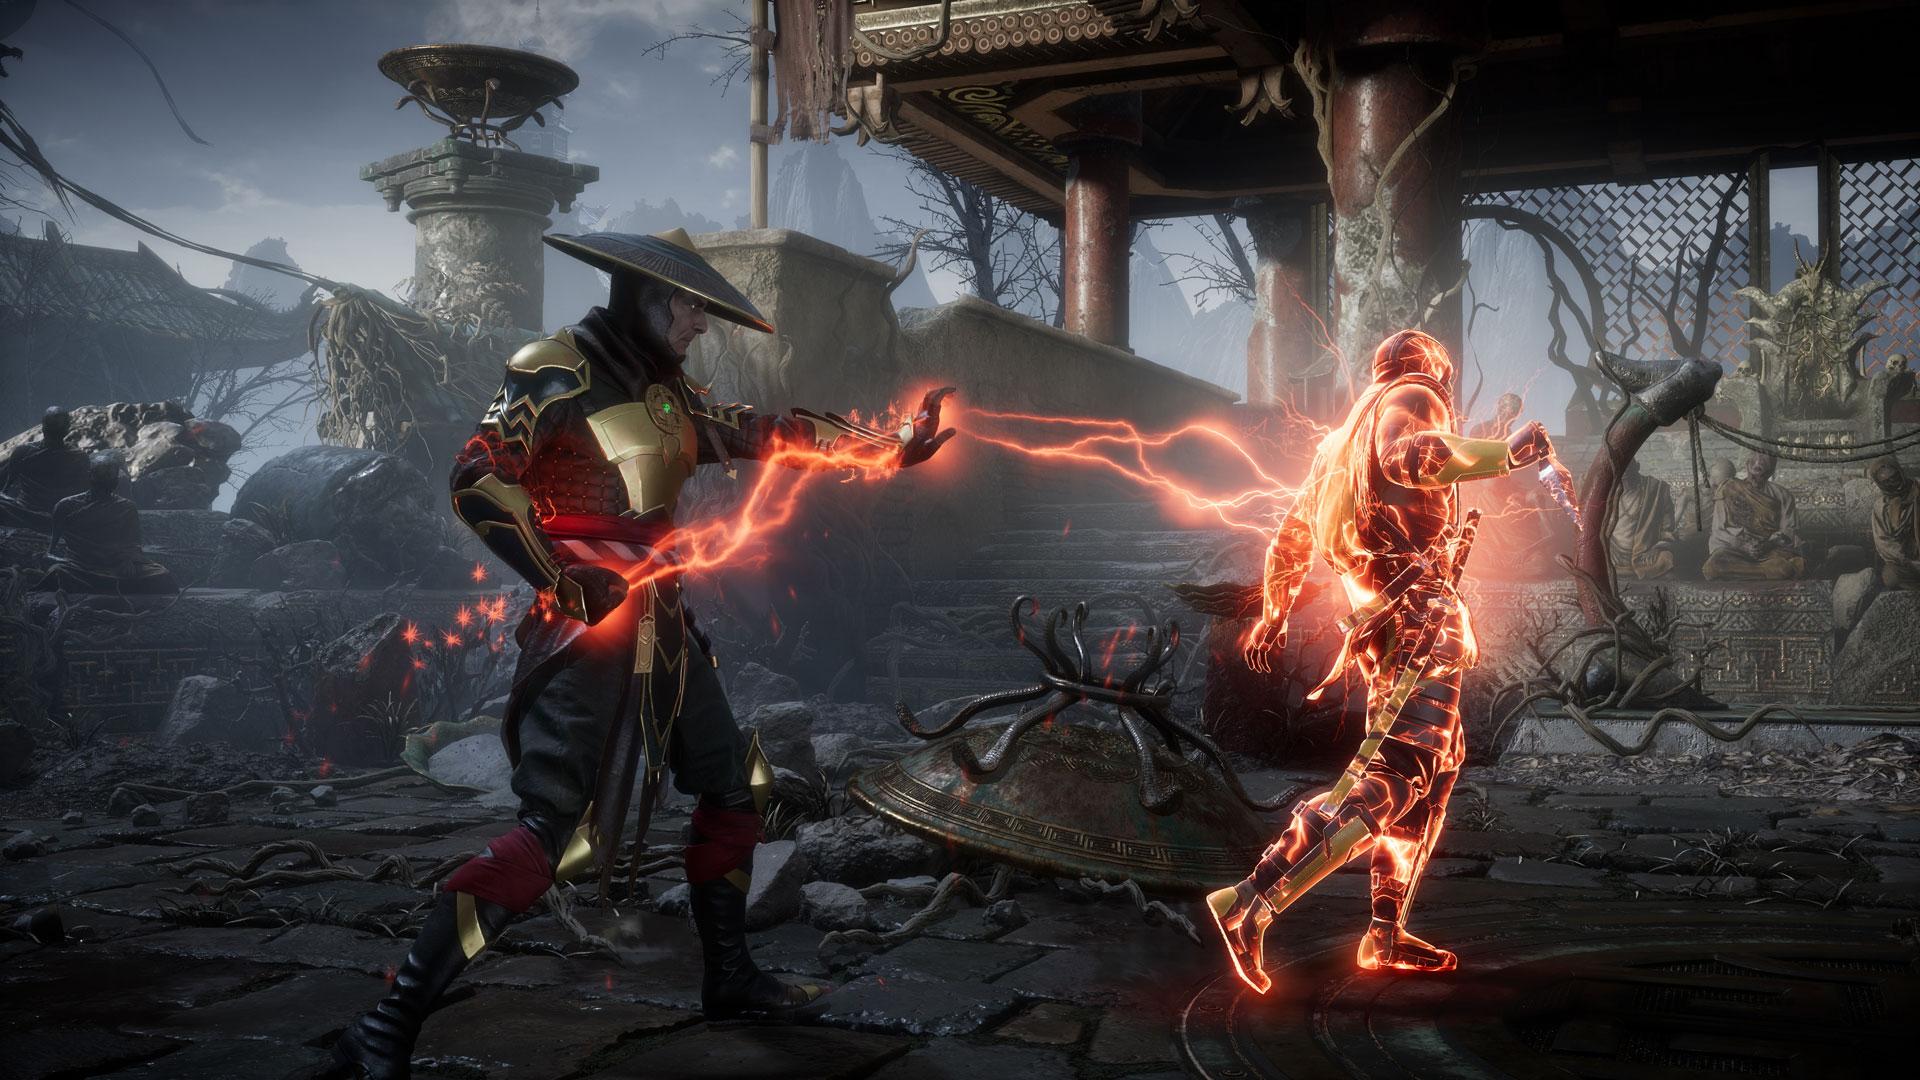 Mortal Kombat 11 Has No Lead SKU